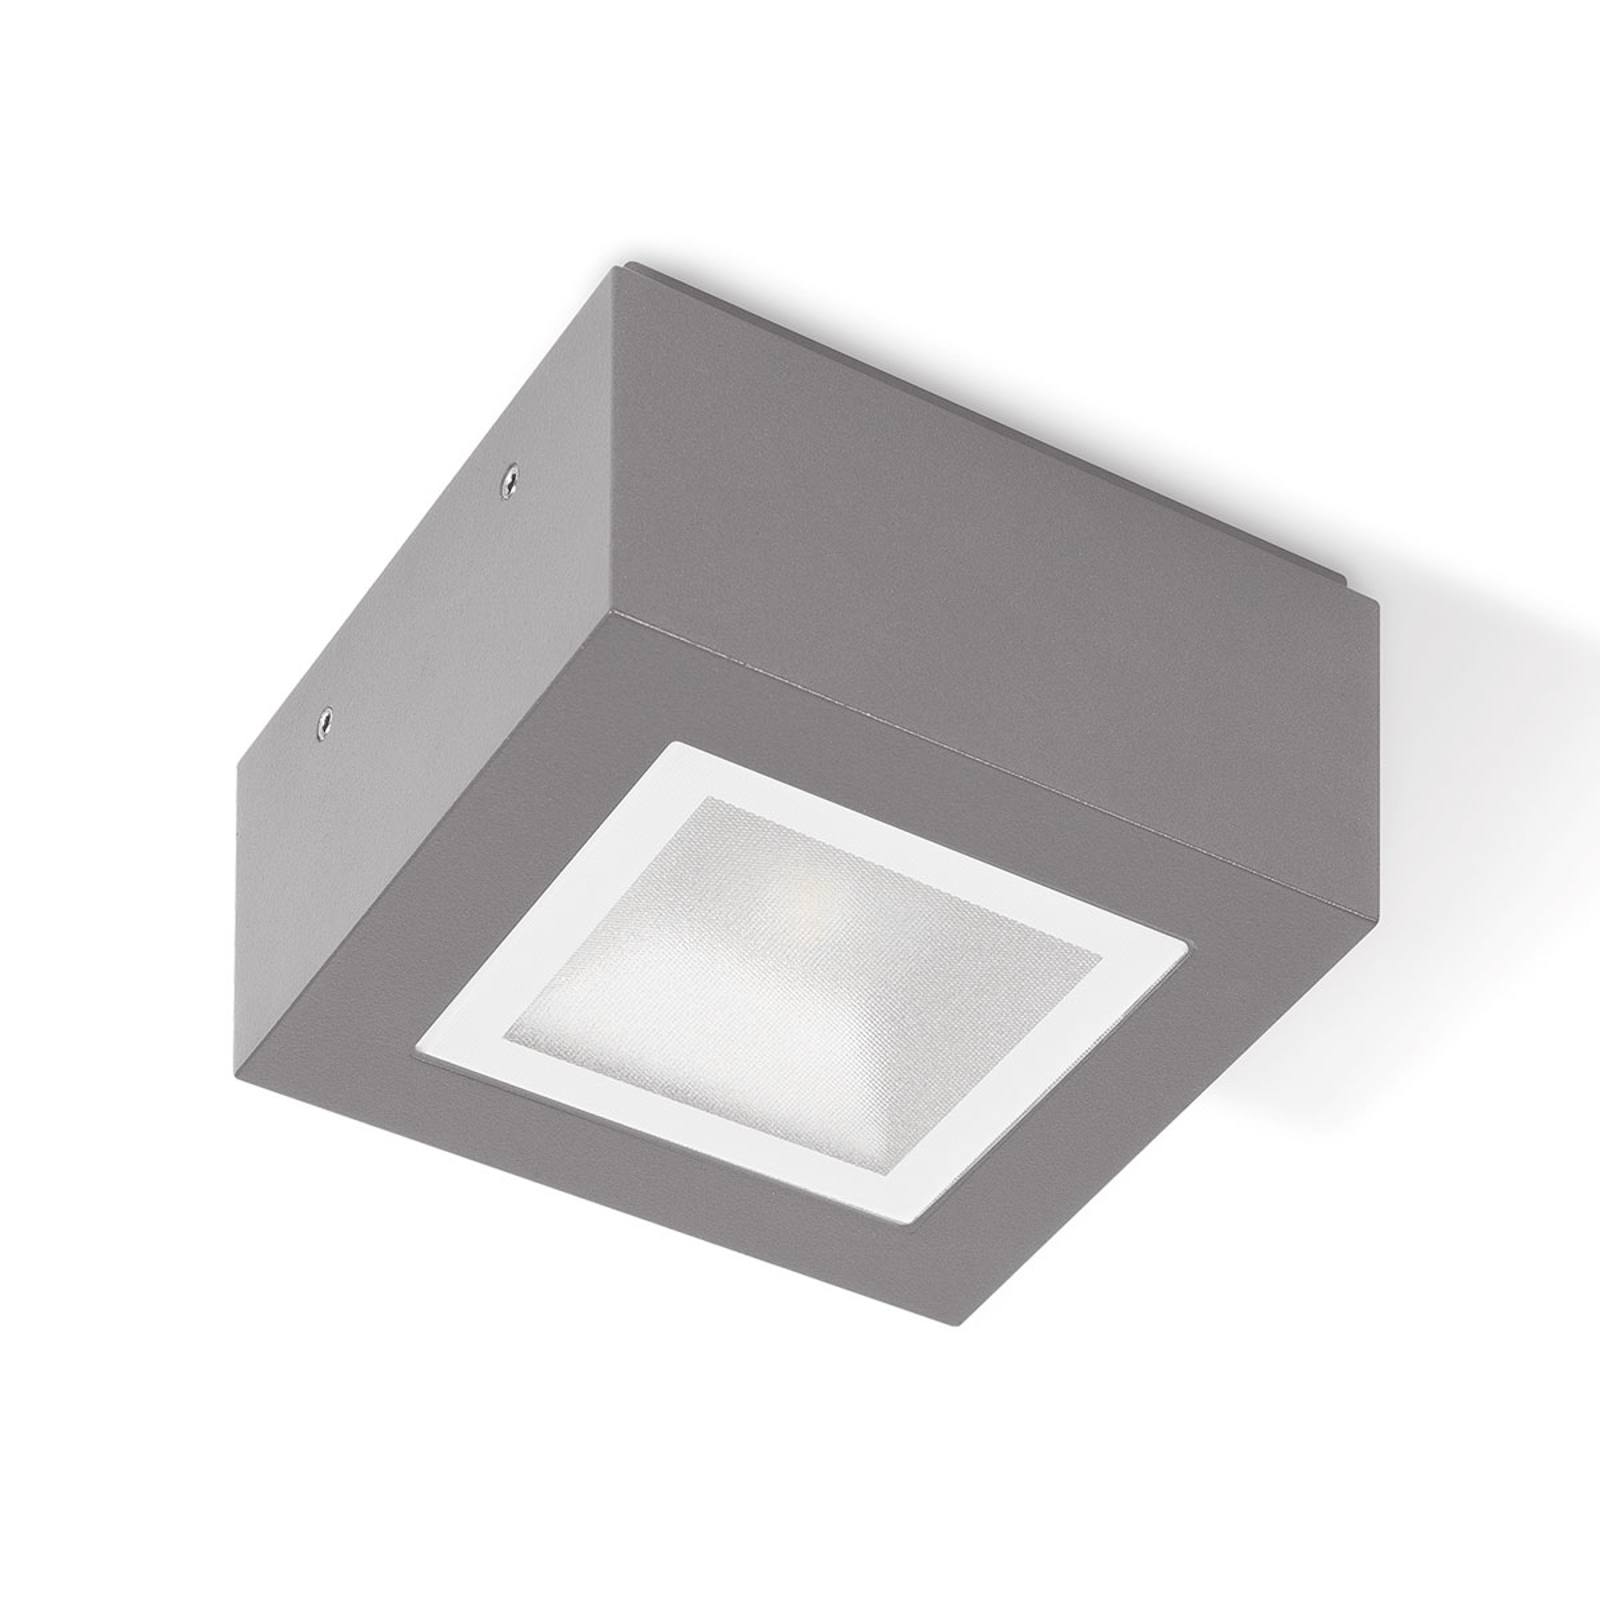 LED plafondlamp Mimik 10 Tech microprisma 3.000K